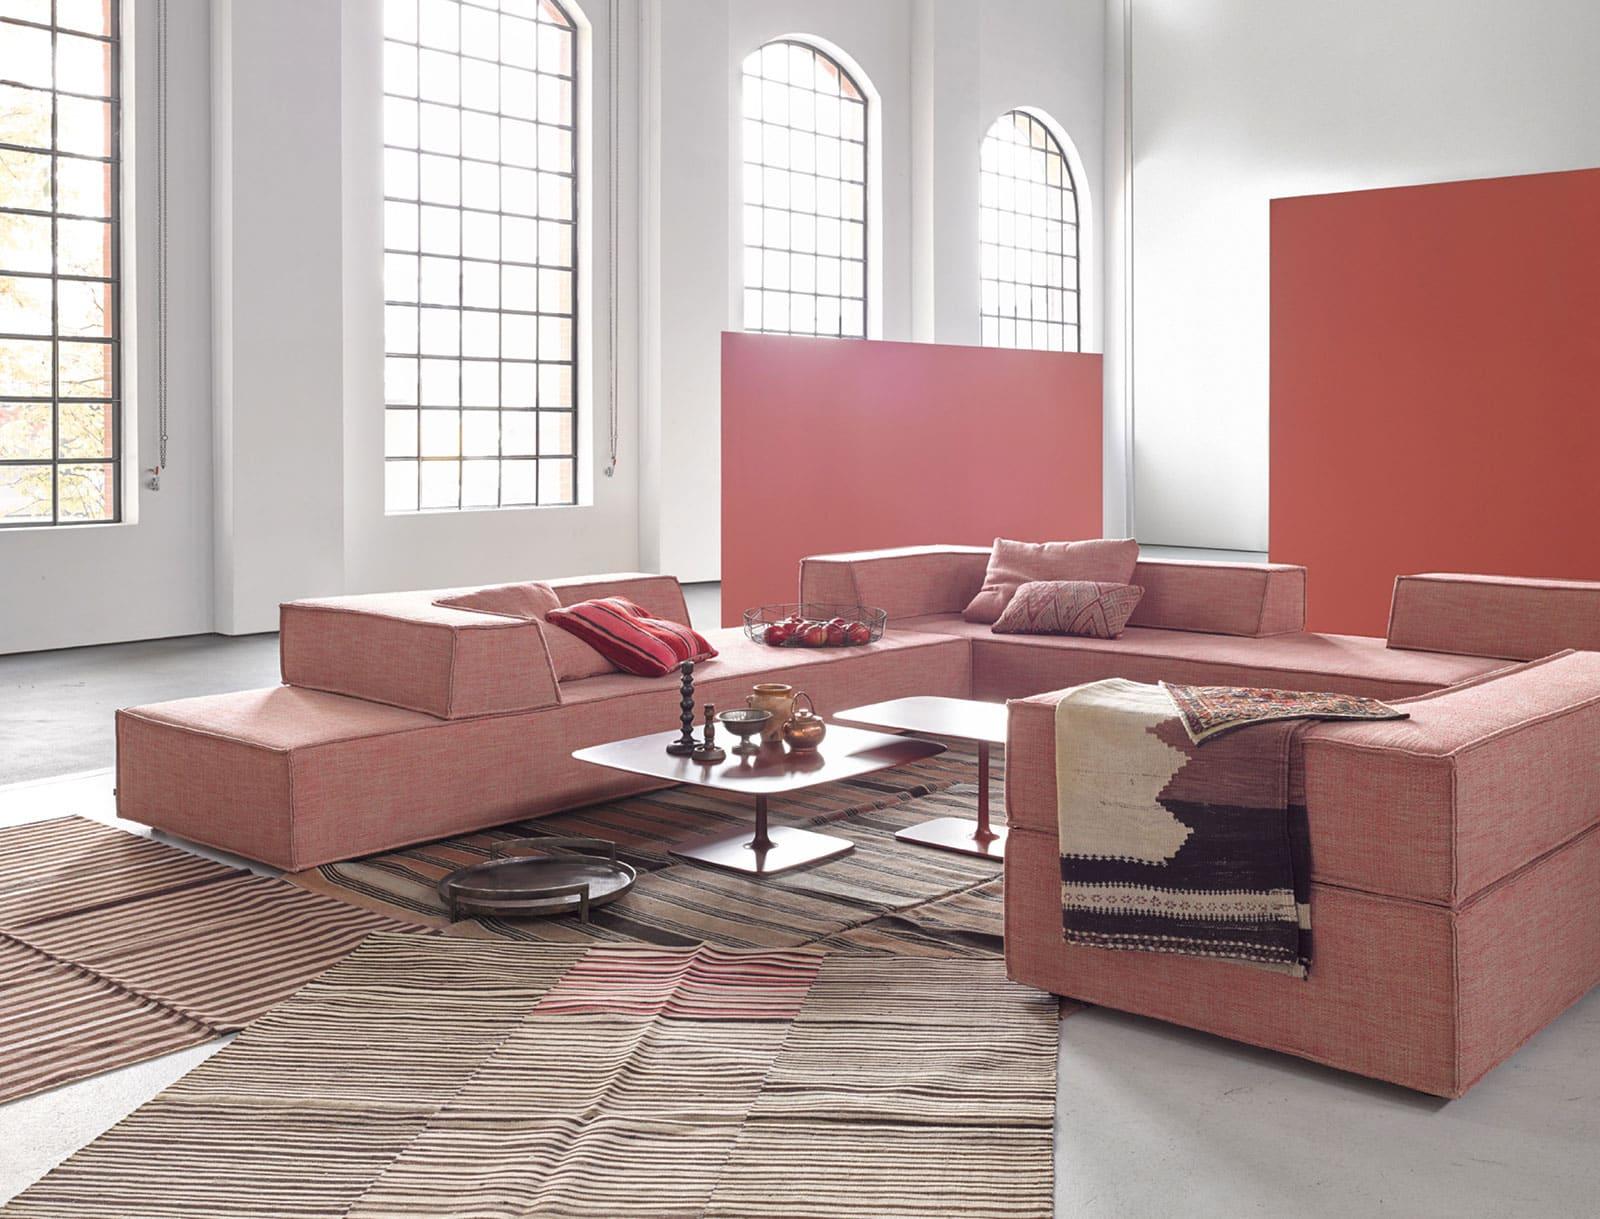 jalis beistelltisch b cor. Black Bedroom Furniture Sets. Home Design Ideas